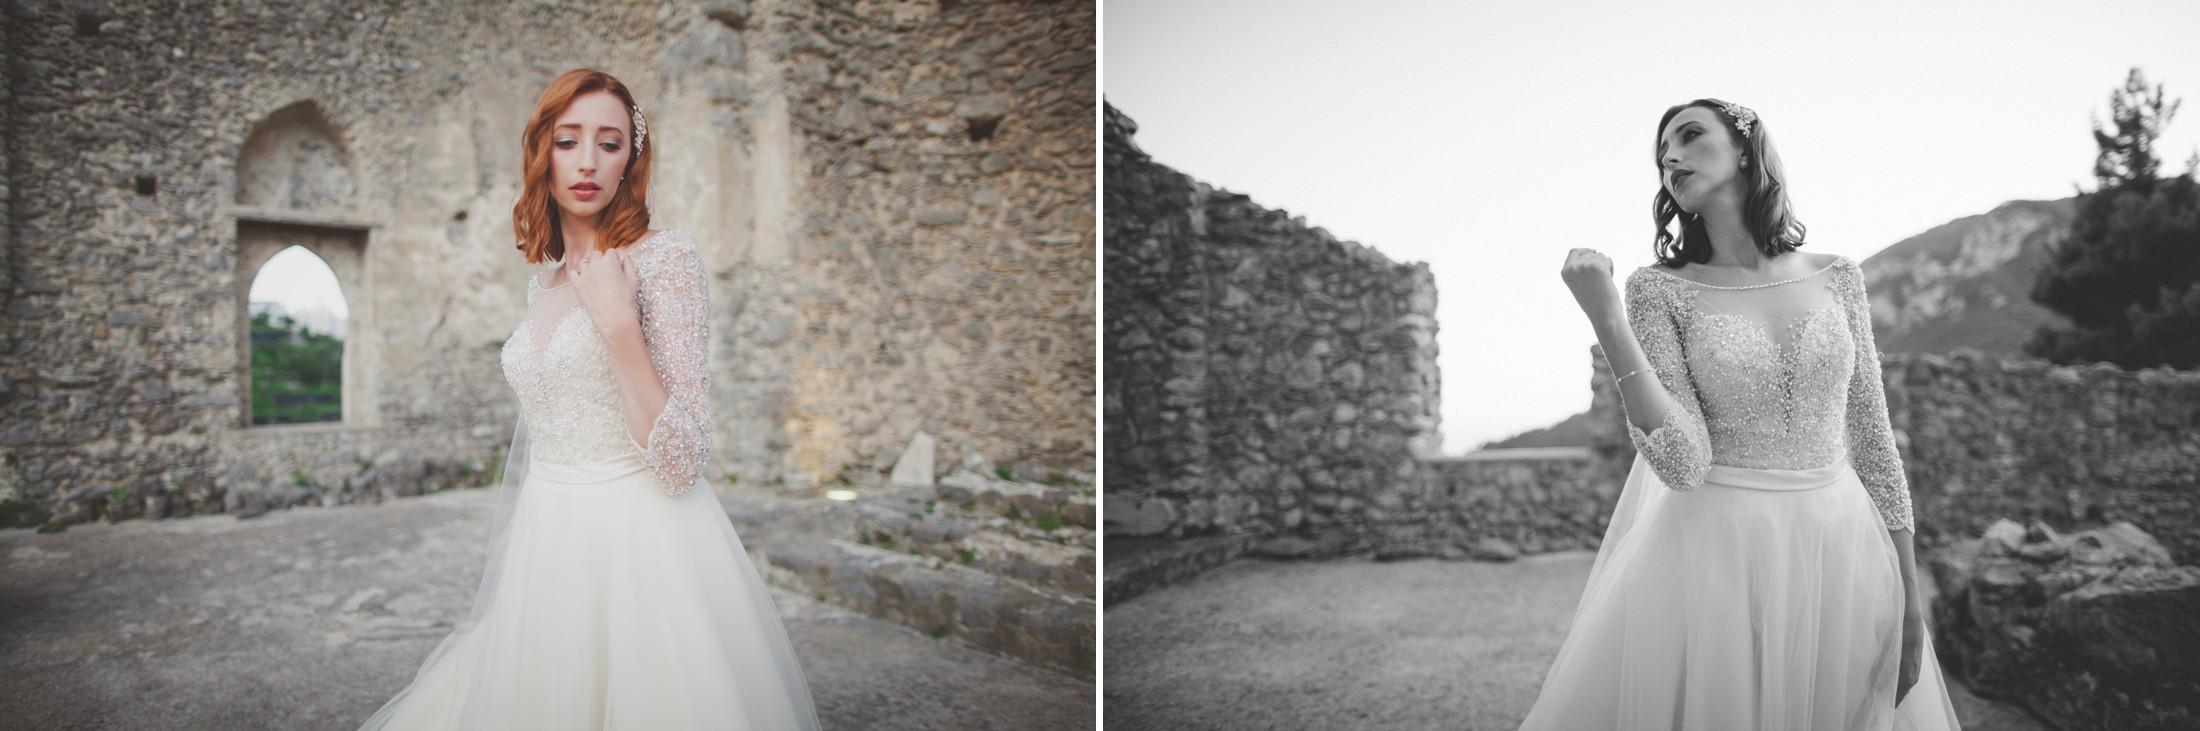 ravello wedding collage bride's portrait